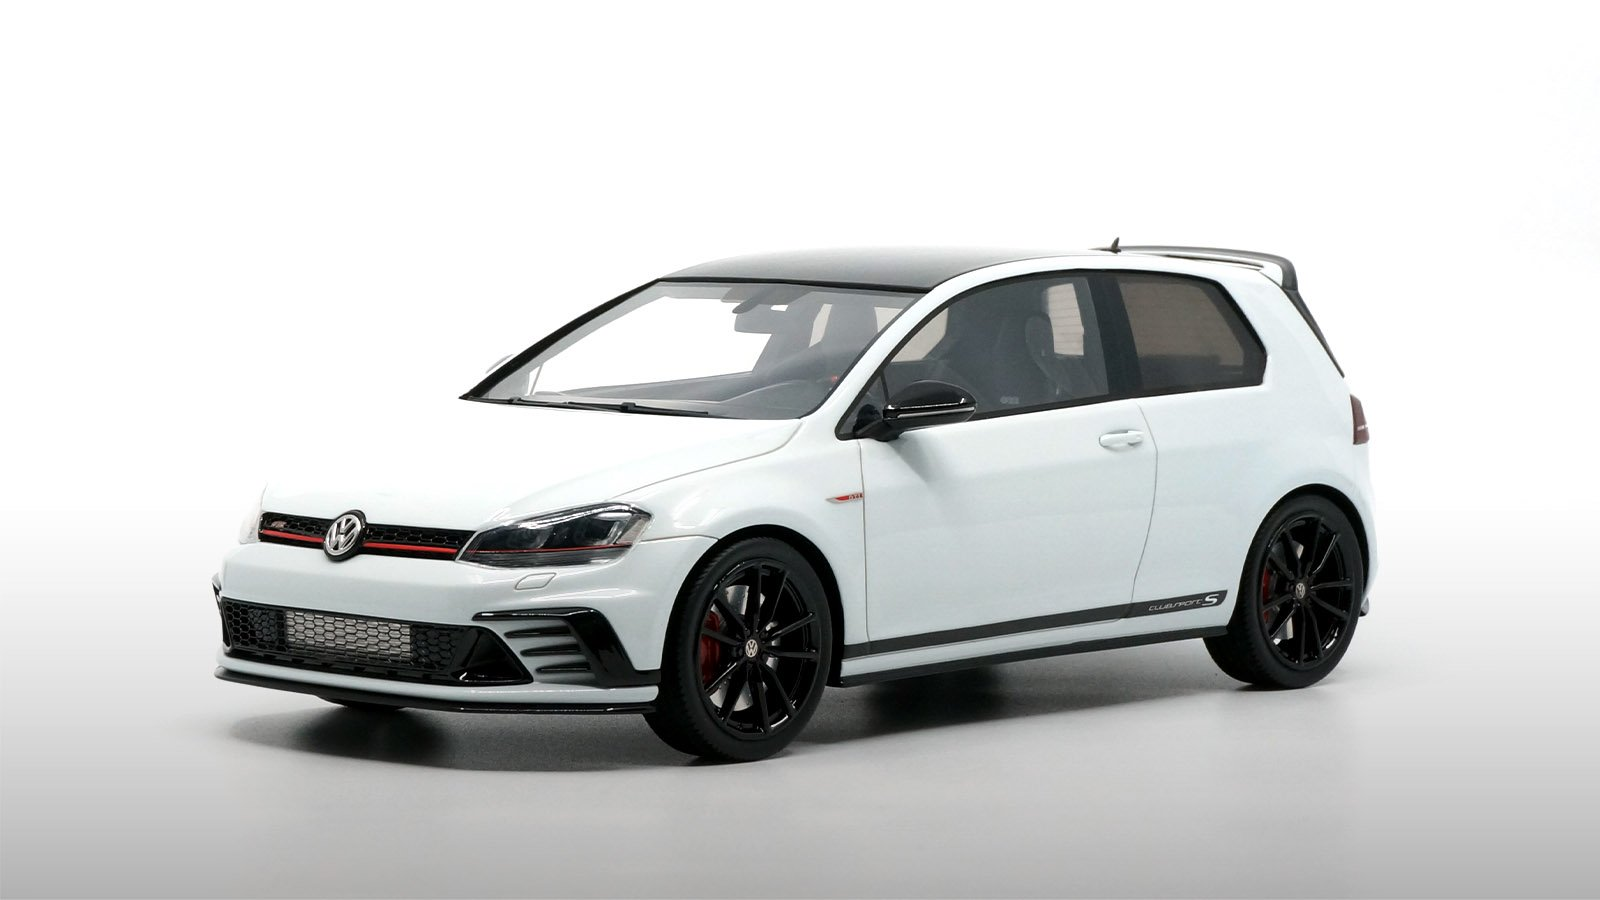 Volkswagen Golf Gti Clubsport S 1 18 Scale Model Dna Collectibles